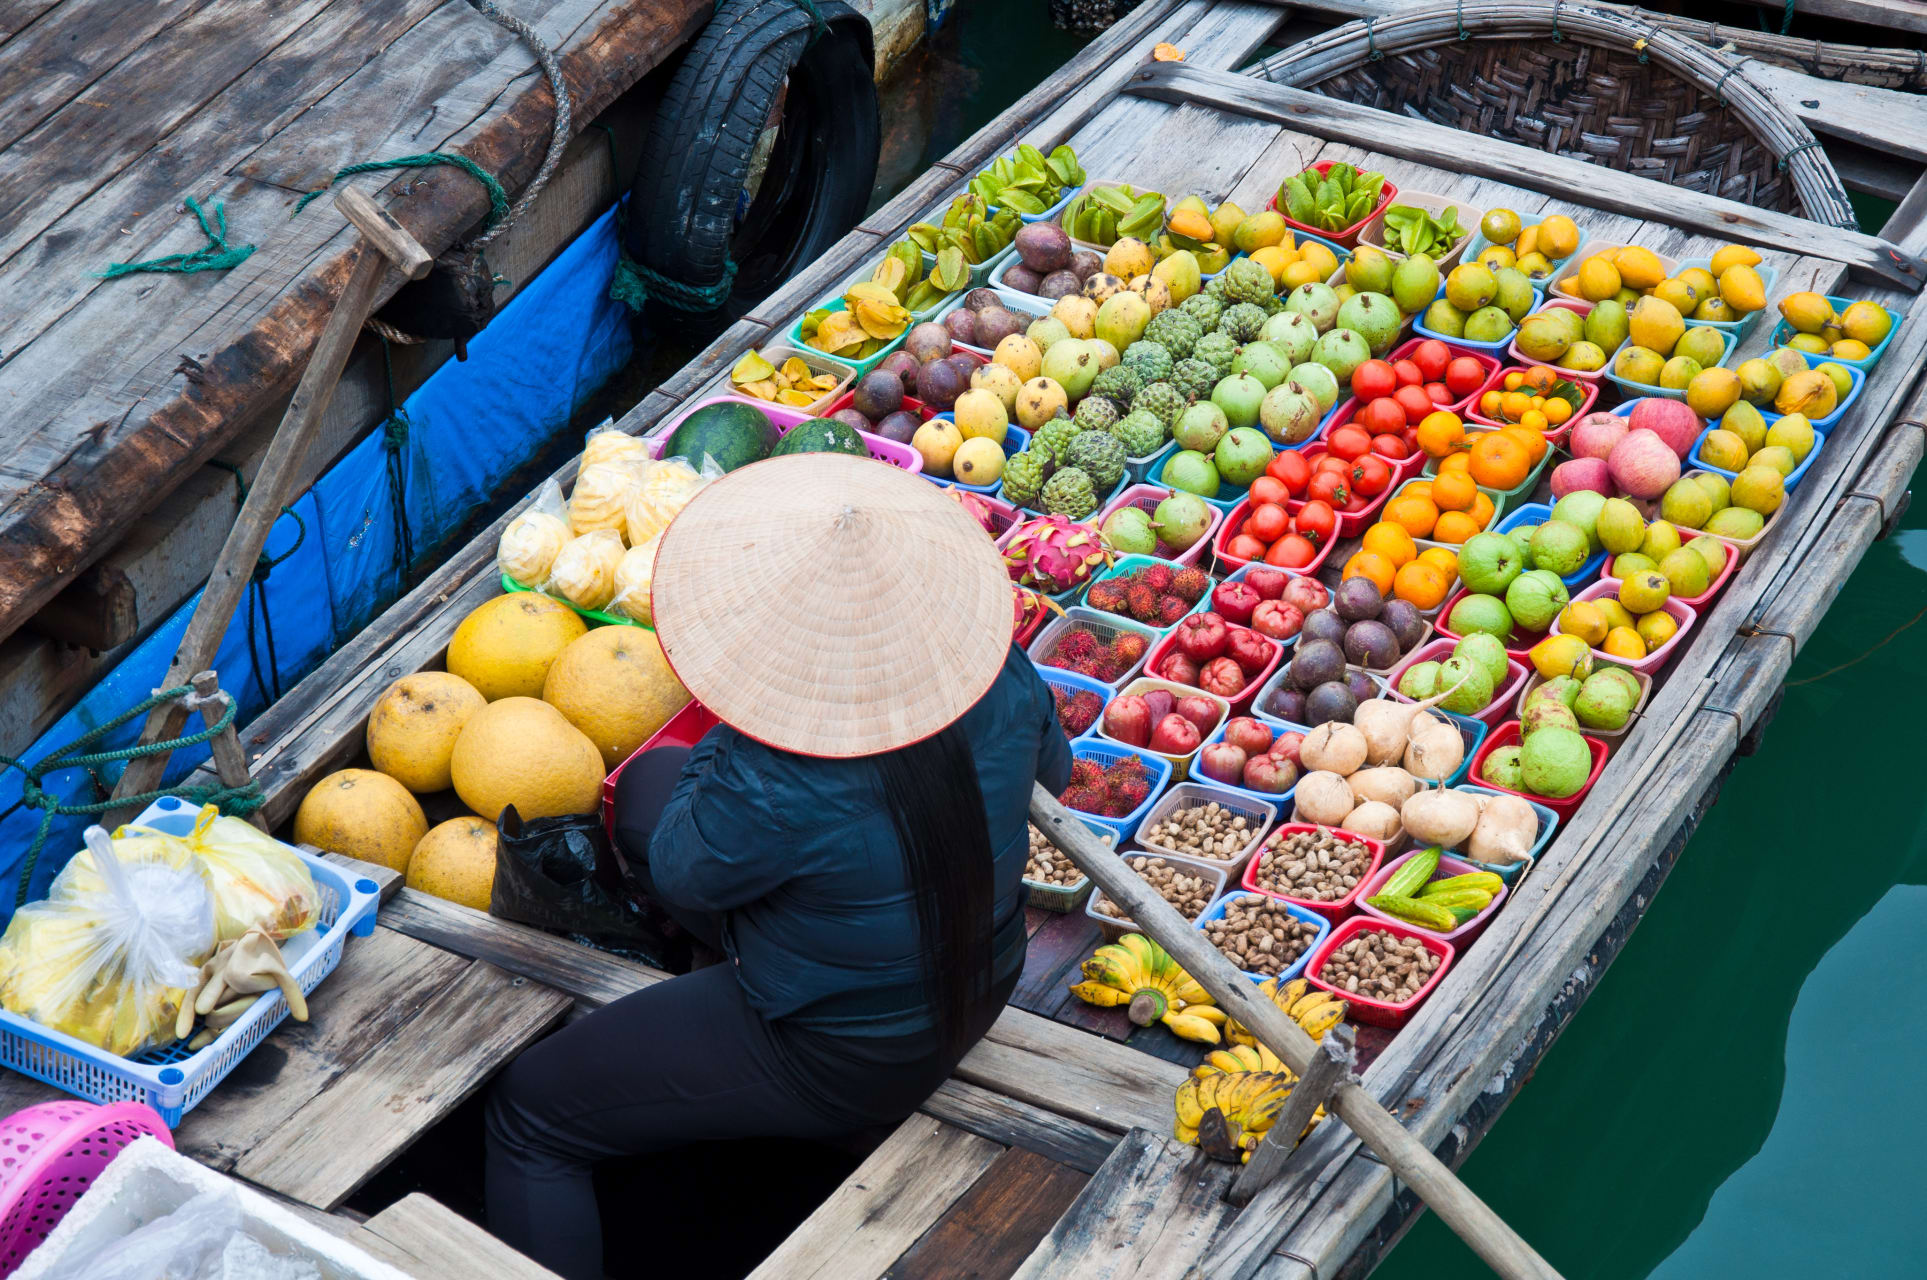 Hue - Hidden Huế - Day 4: Nọ Market (it's a market)